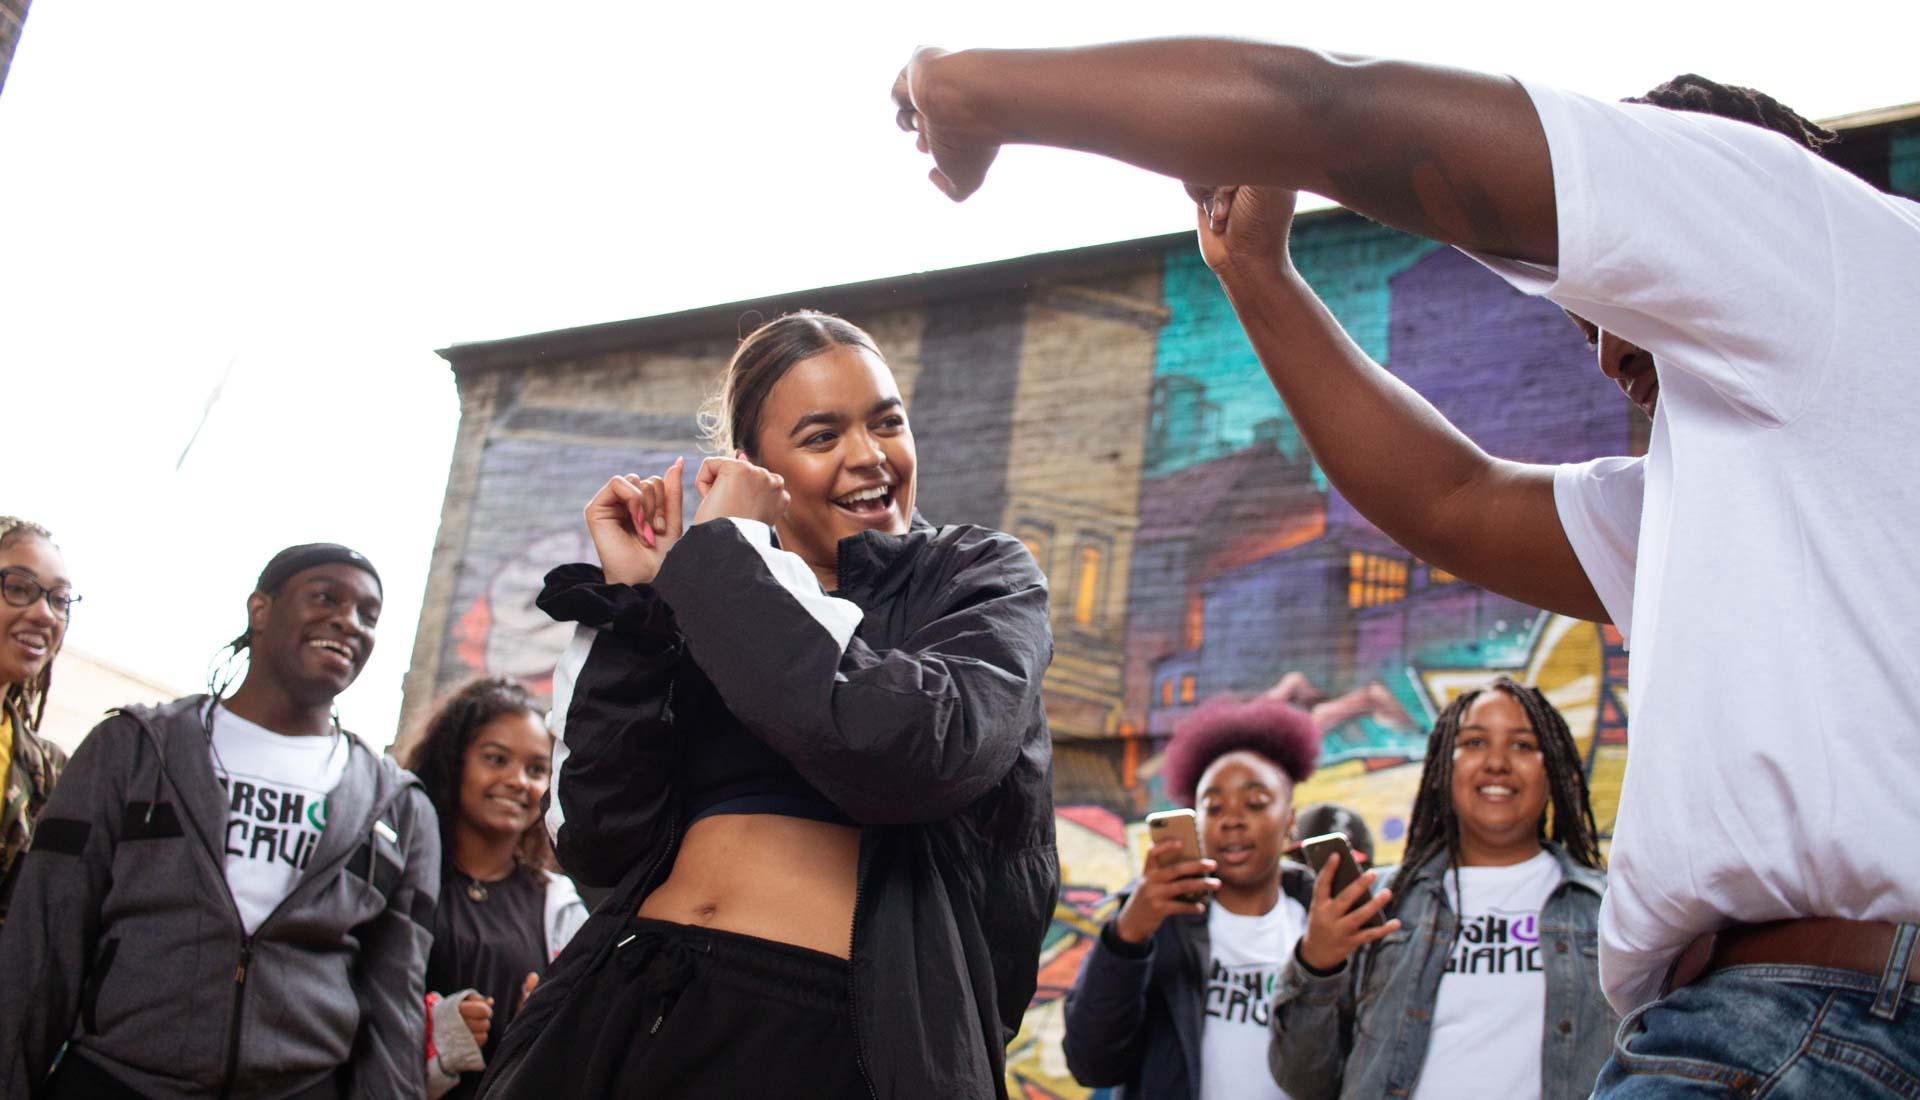 Dance event photography by Anastasia Jobson. Birmingham Weekender 2019, Dance Jam in Digbeth